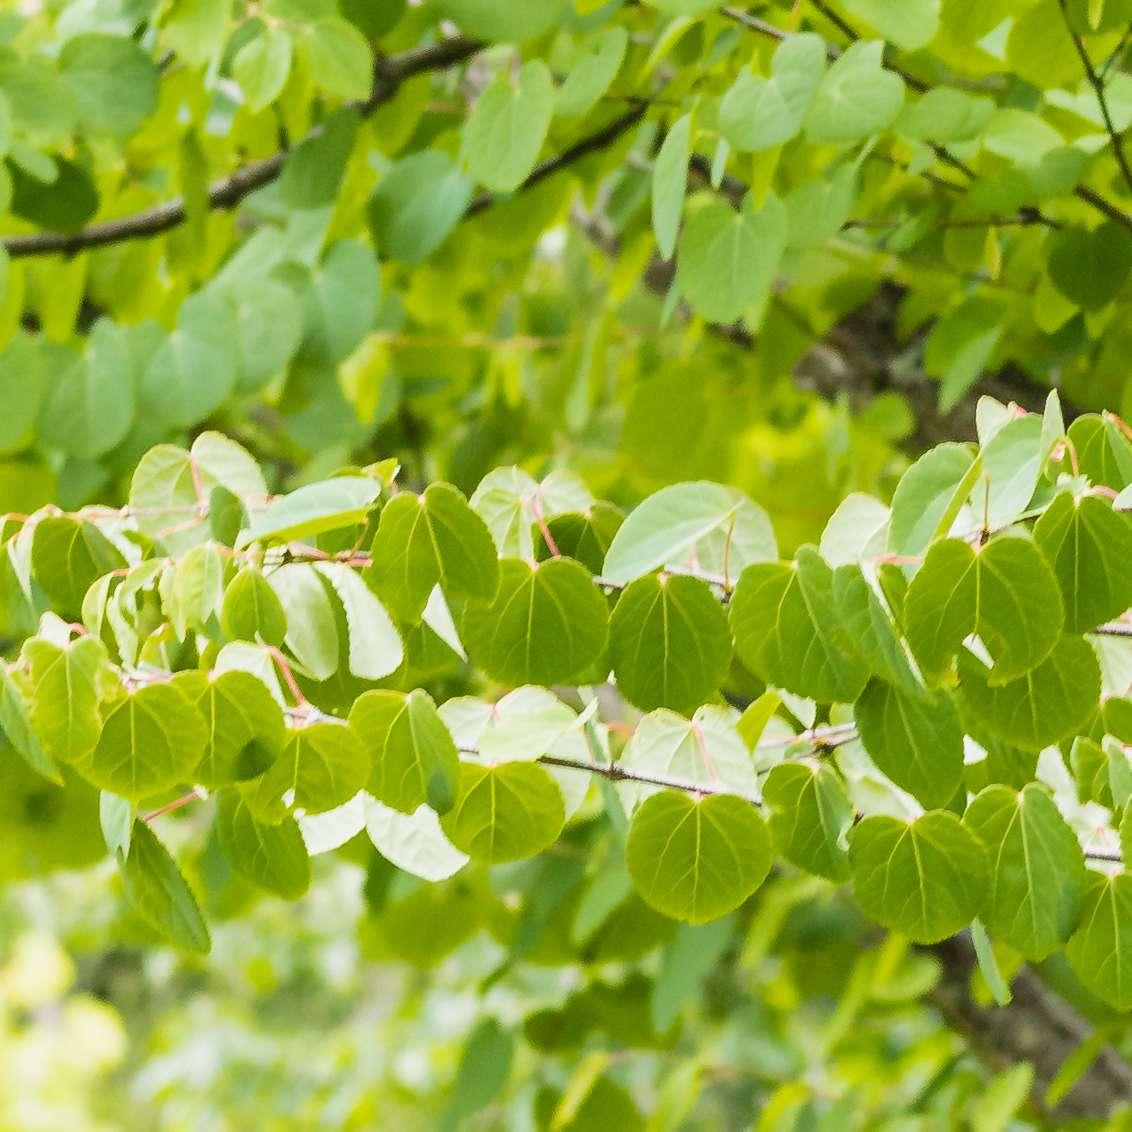 Katsura tree branch closeup with green leaves